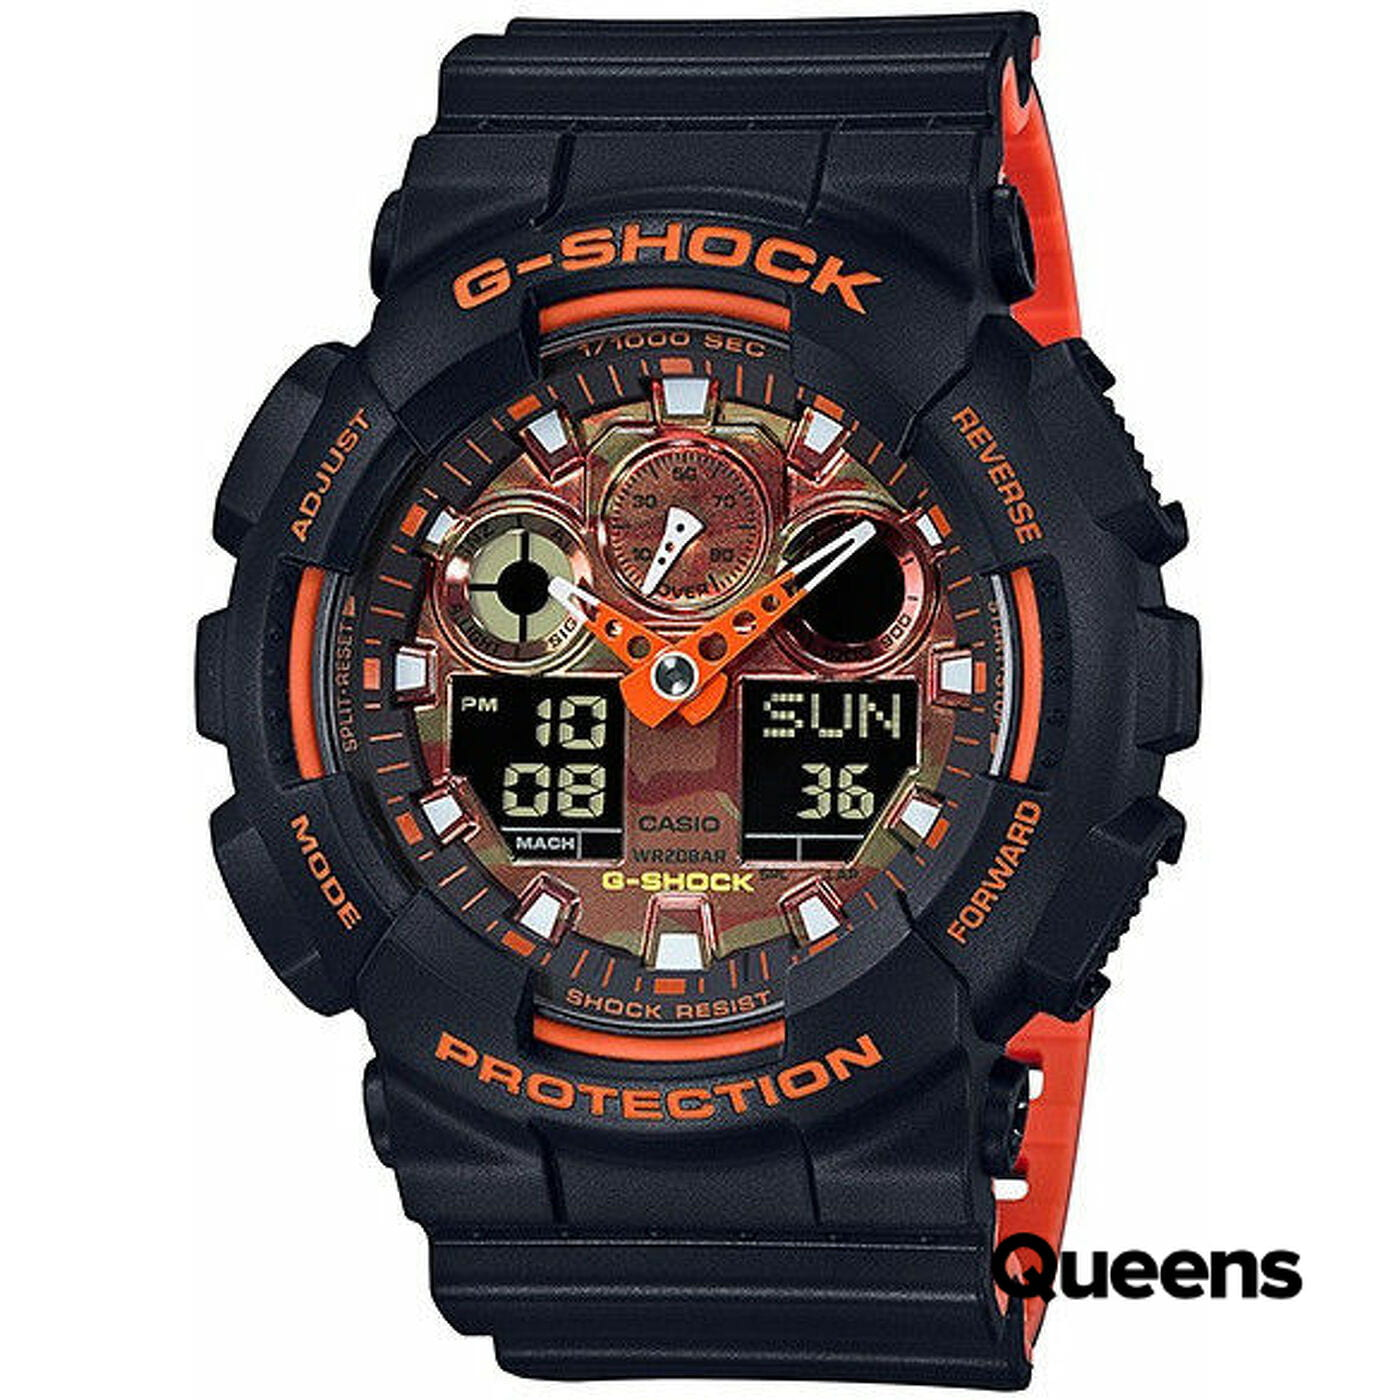 Casio G-Shock GA 100BR-1AER čierne / oranžové